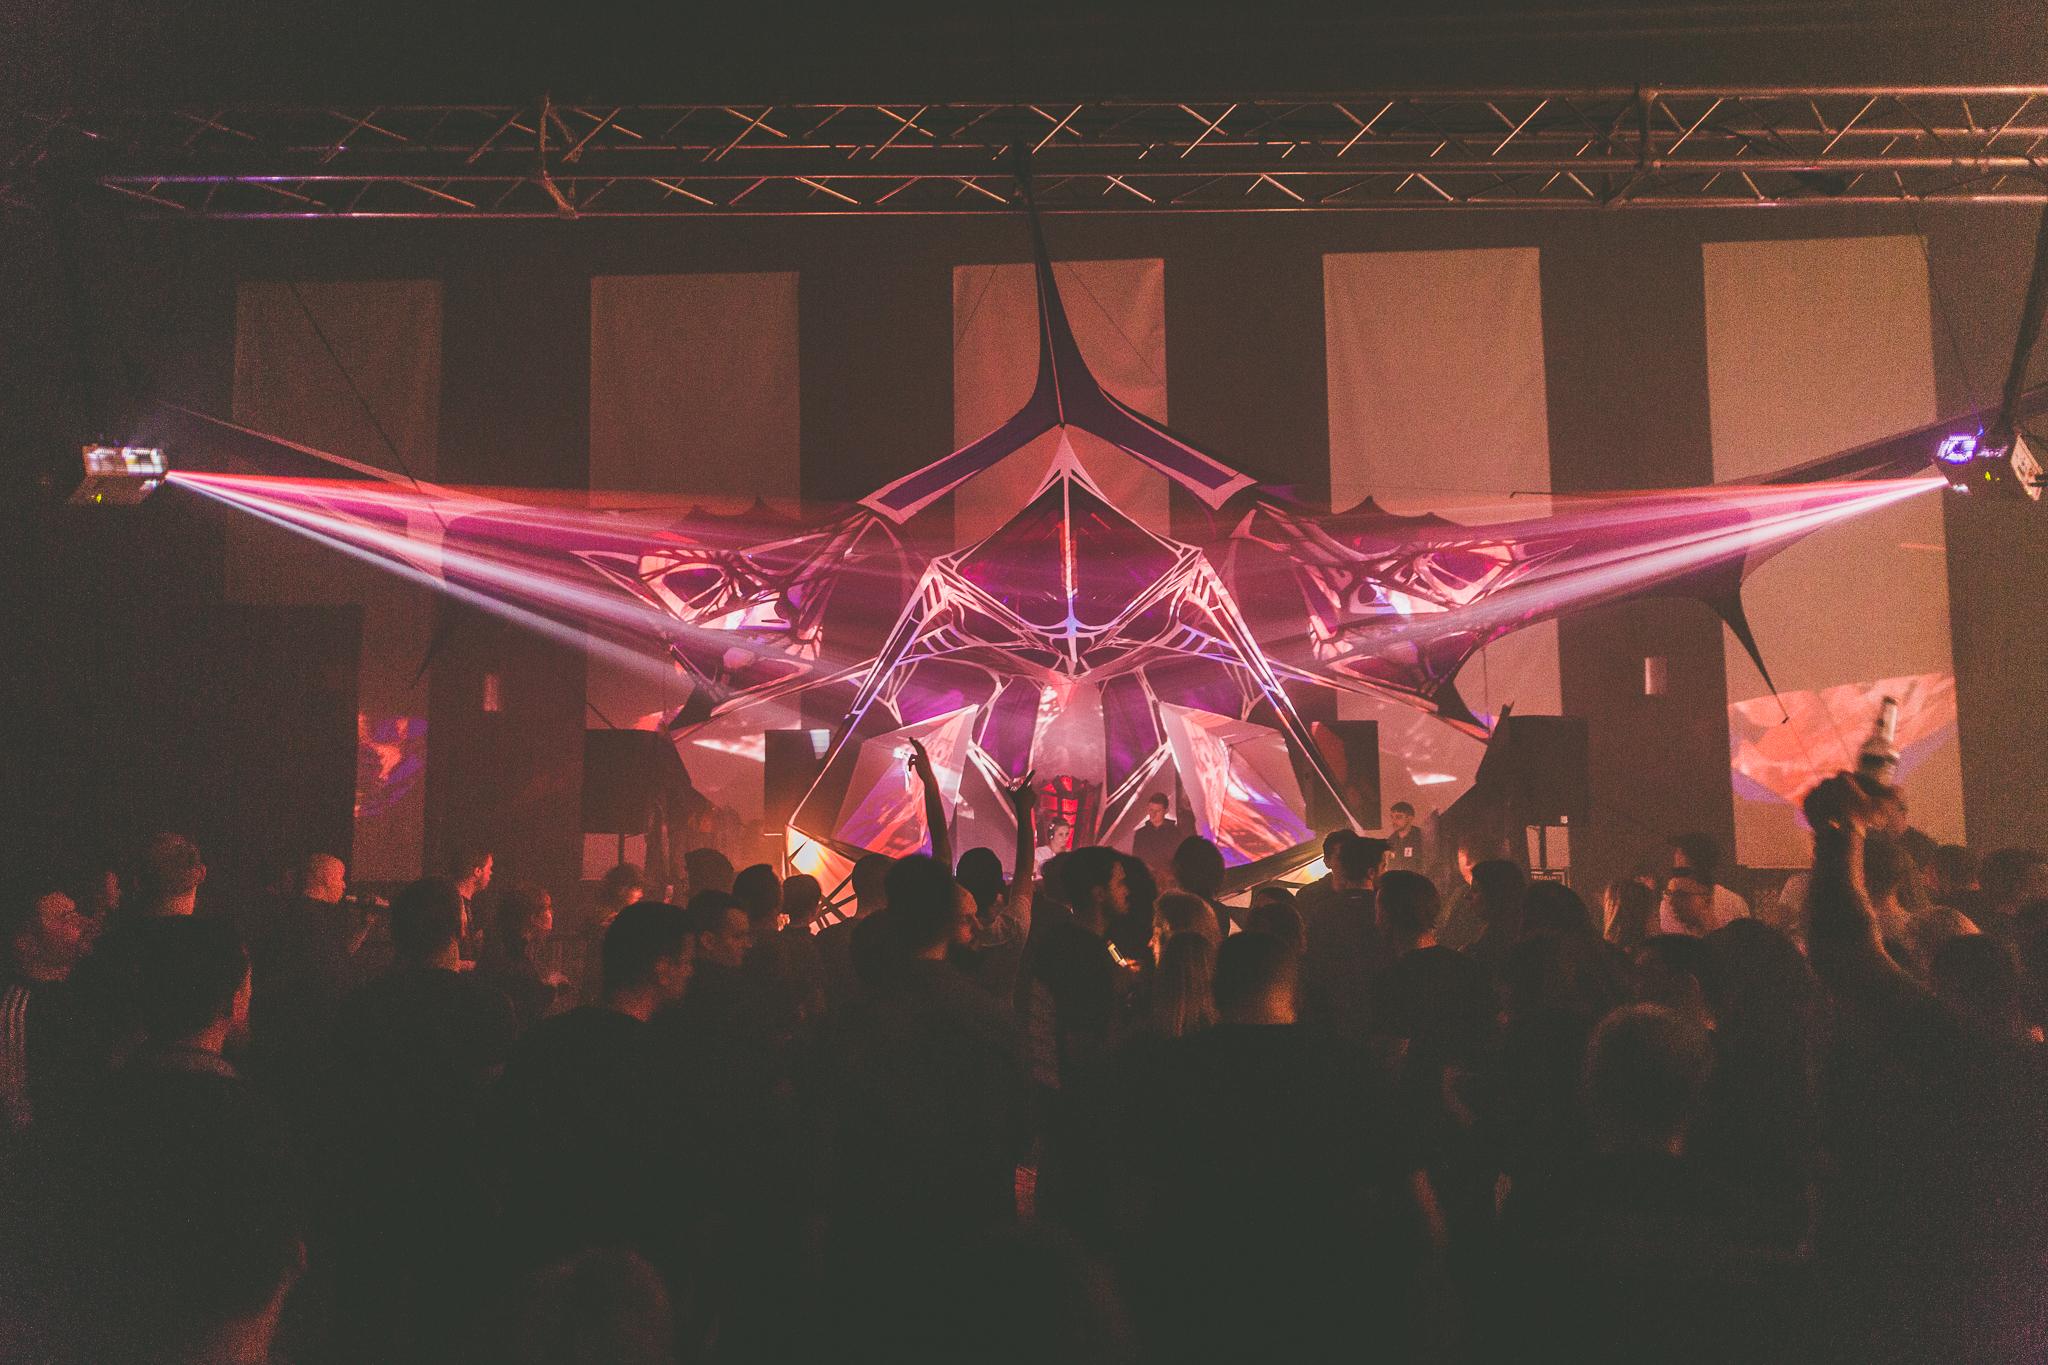 Breslau Techno showcase x TAMA • 26 I '19